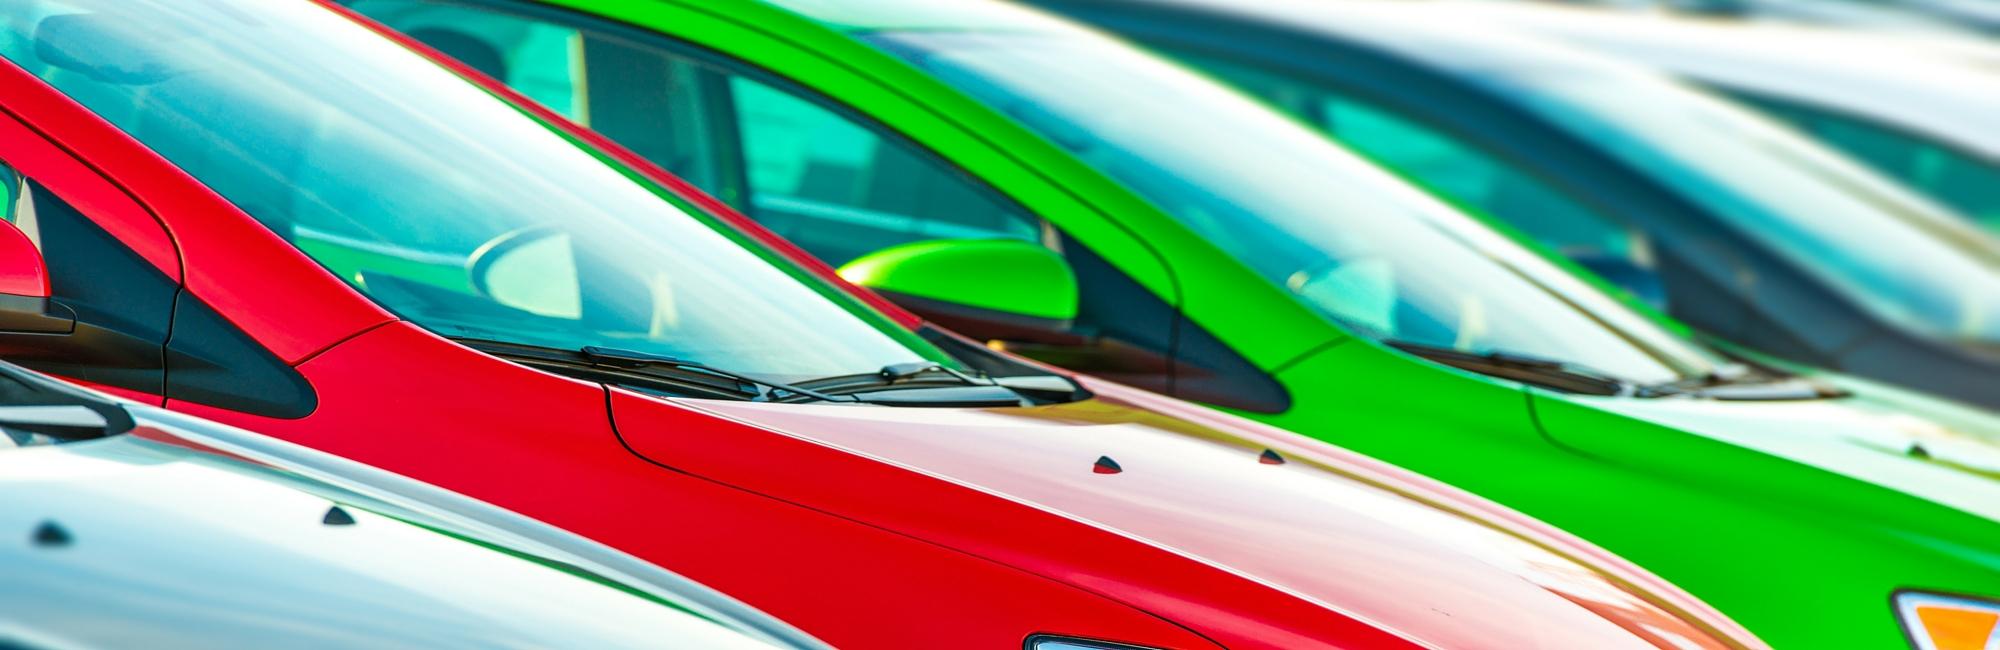 Autos colores